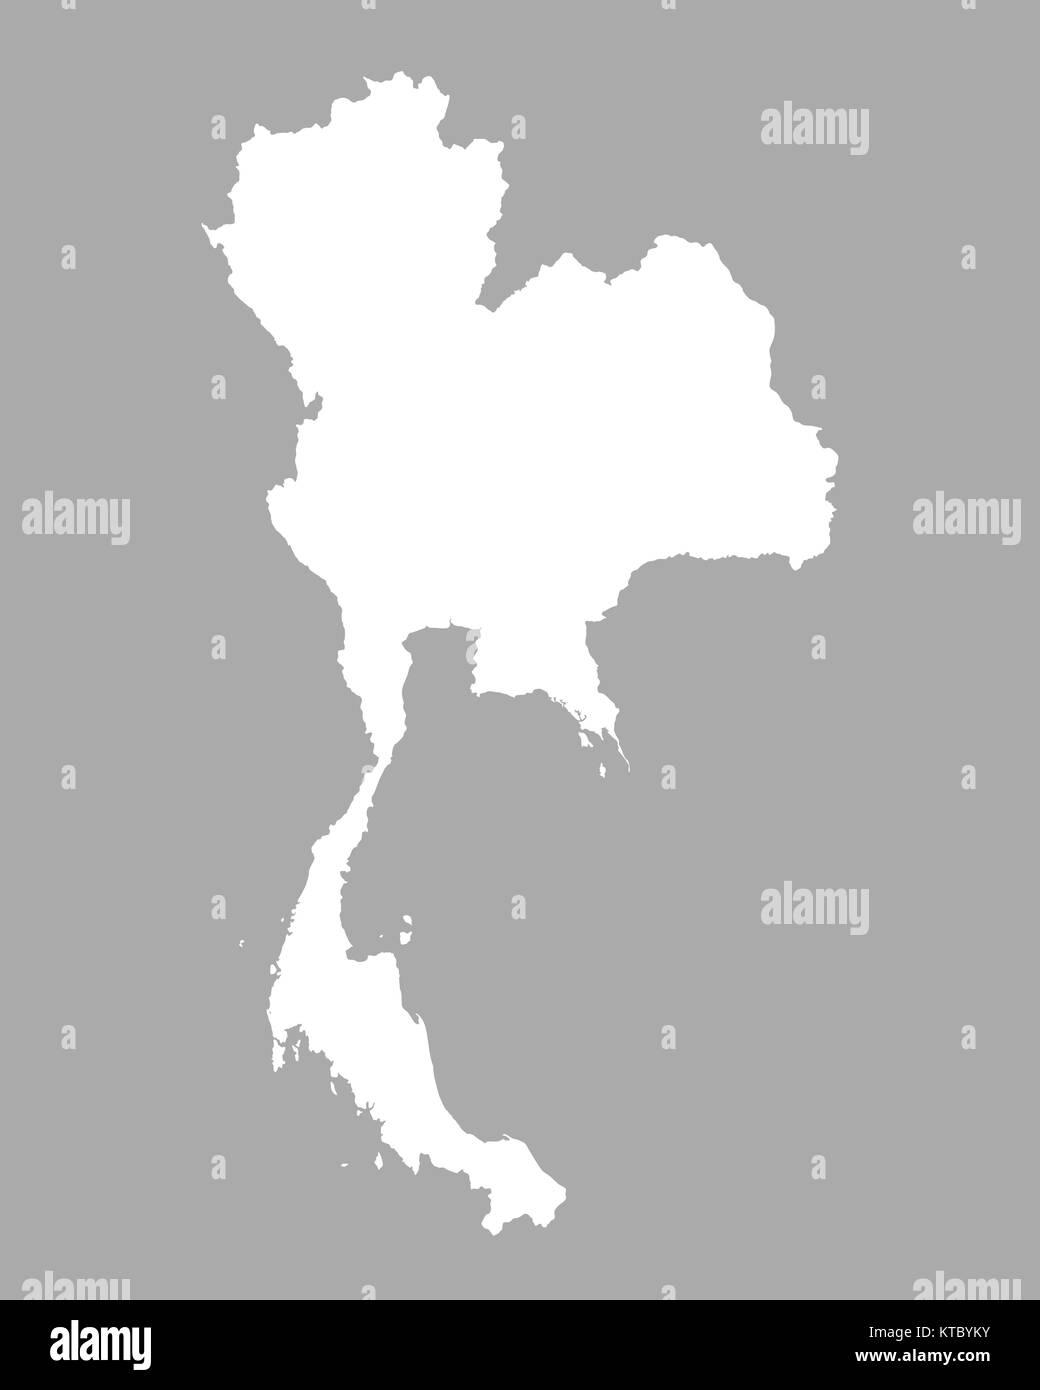 Thailand Karte.Thailand Karte Black And White Stock Photos Images Alamy